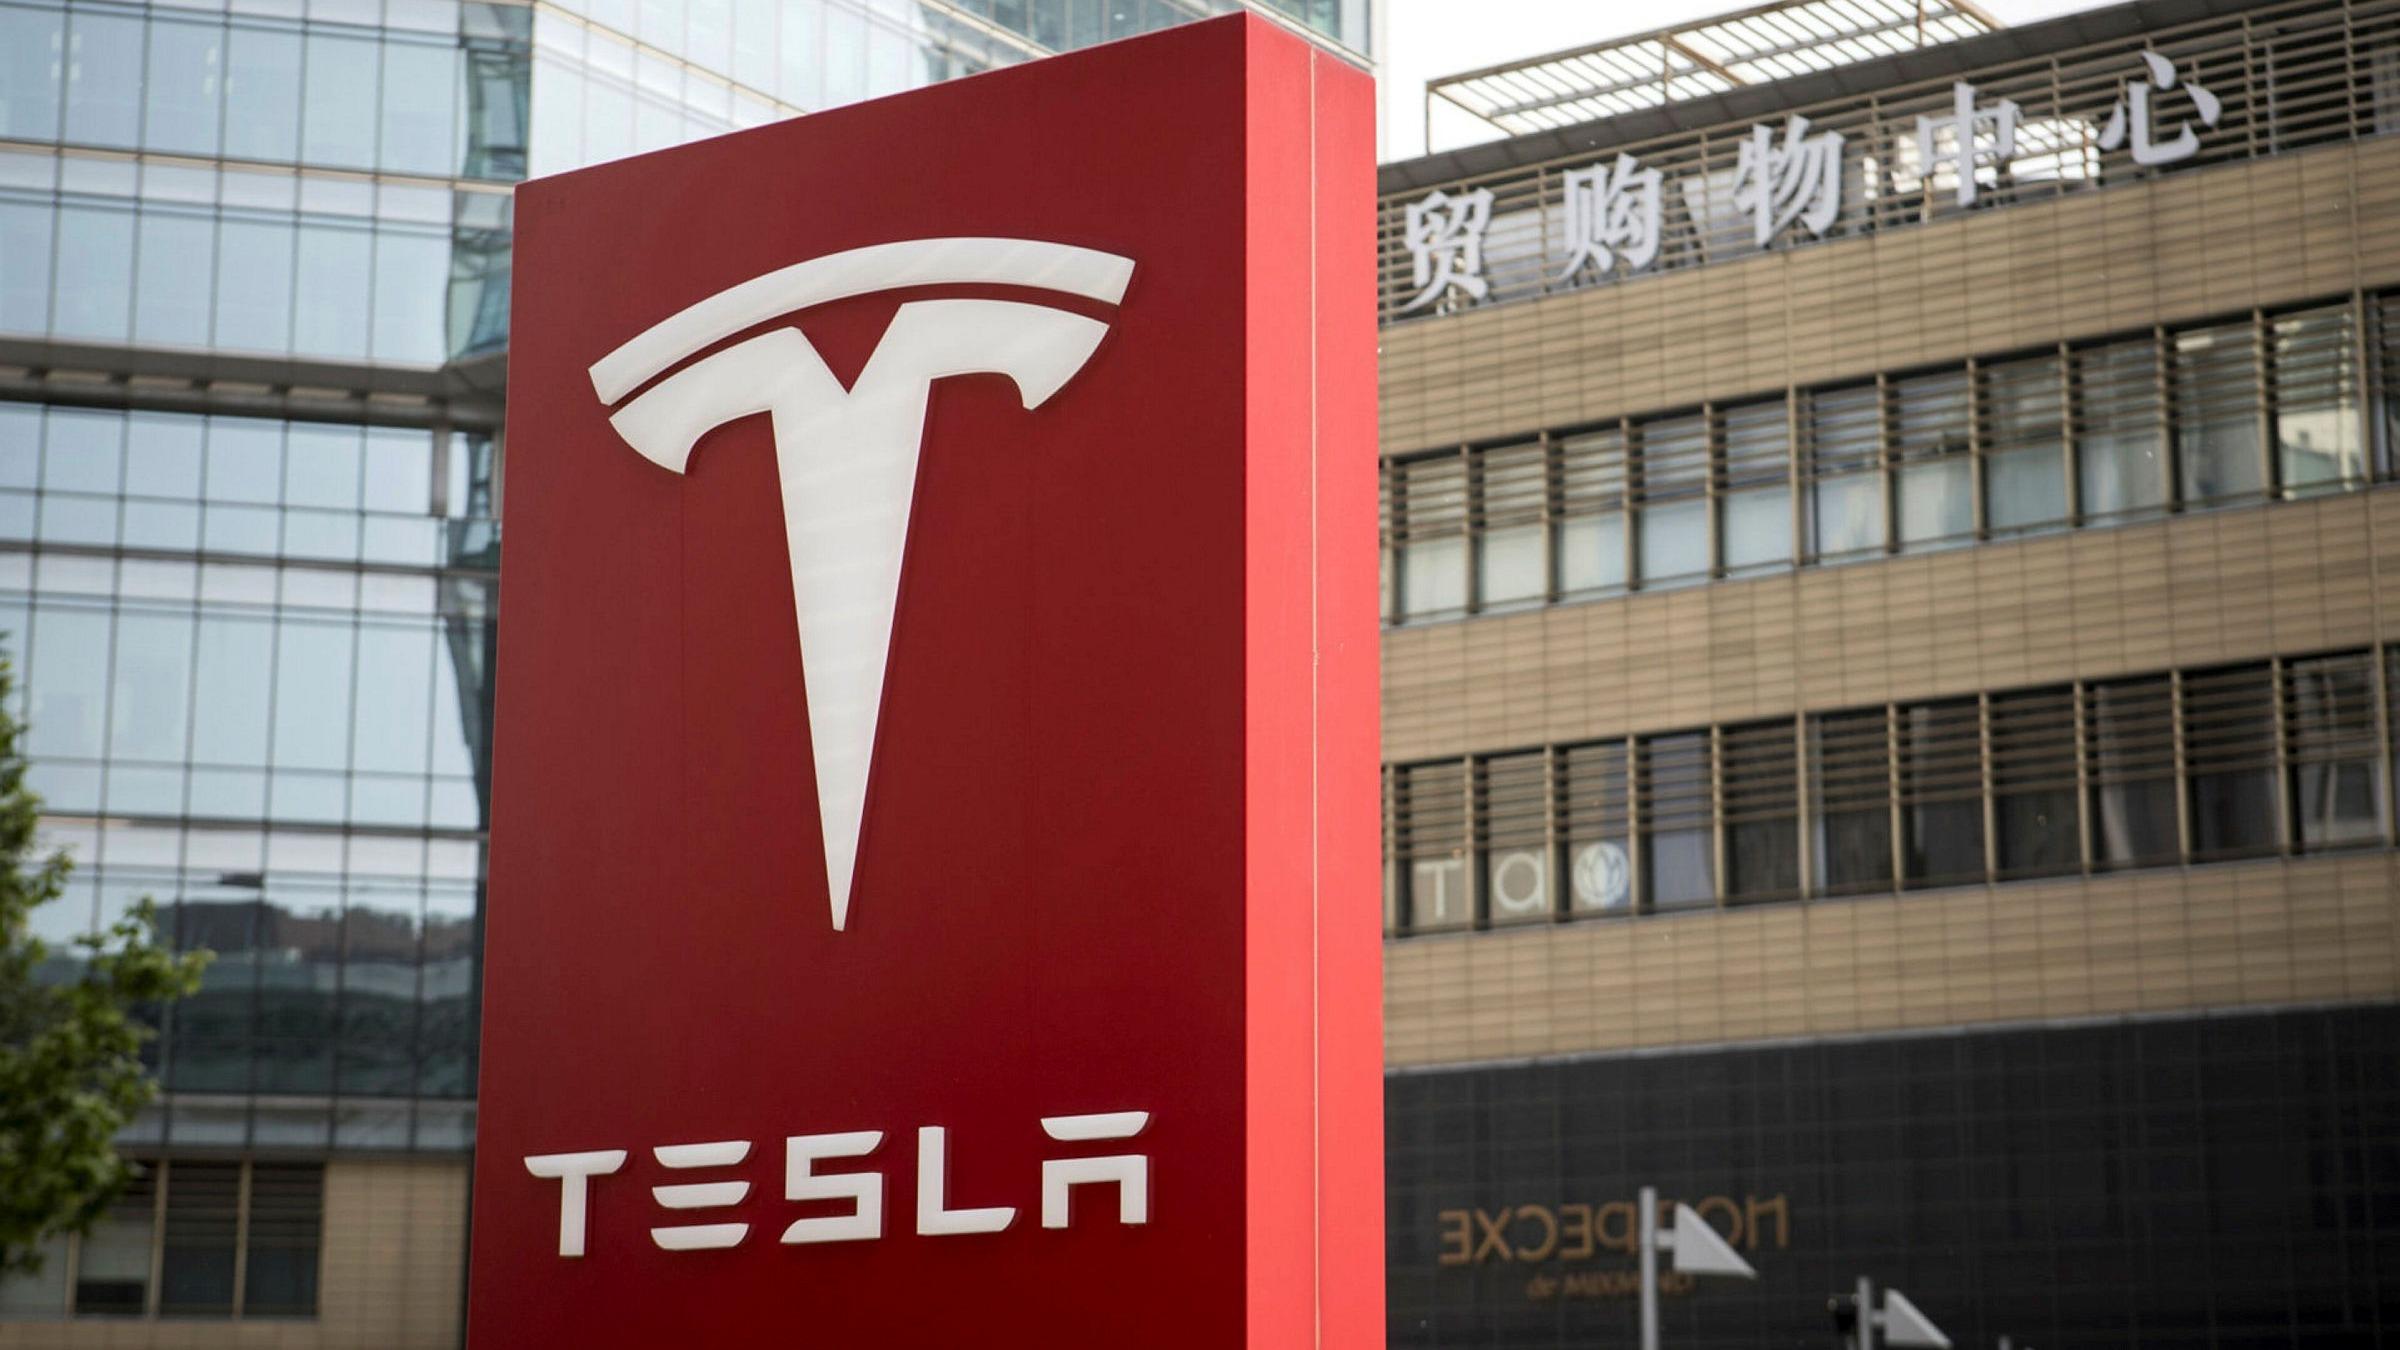 Tesla Insurance: worth more than Aviva